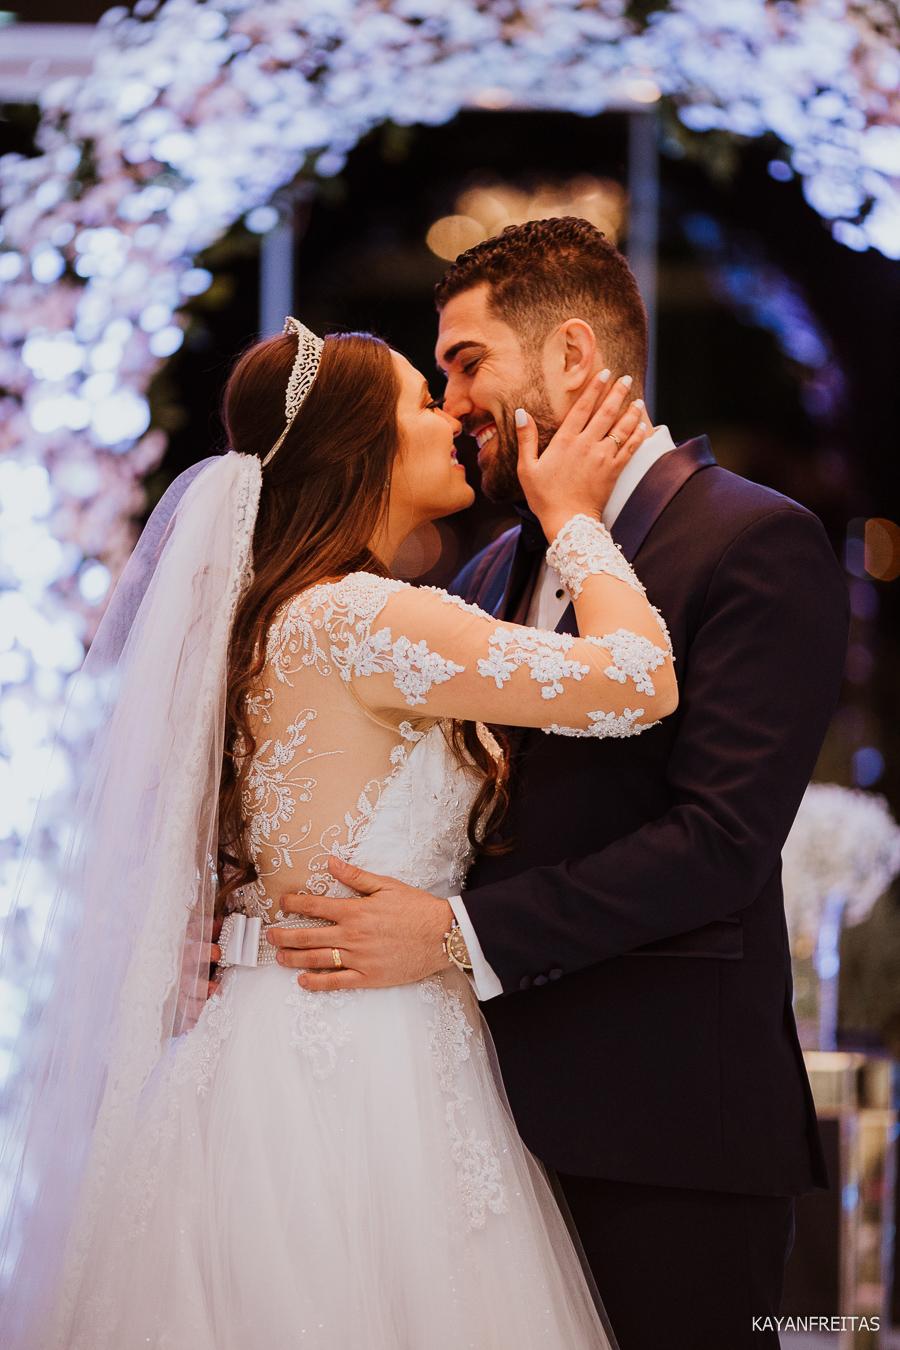 casamento-lic-florianopolis-ariane-diogo-0082 Casamento Ariane e Diogo - LIC Florianópolis